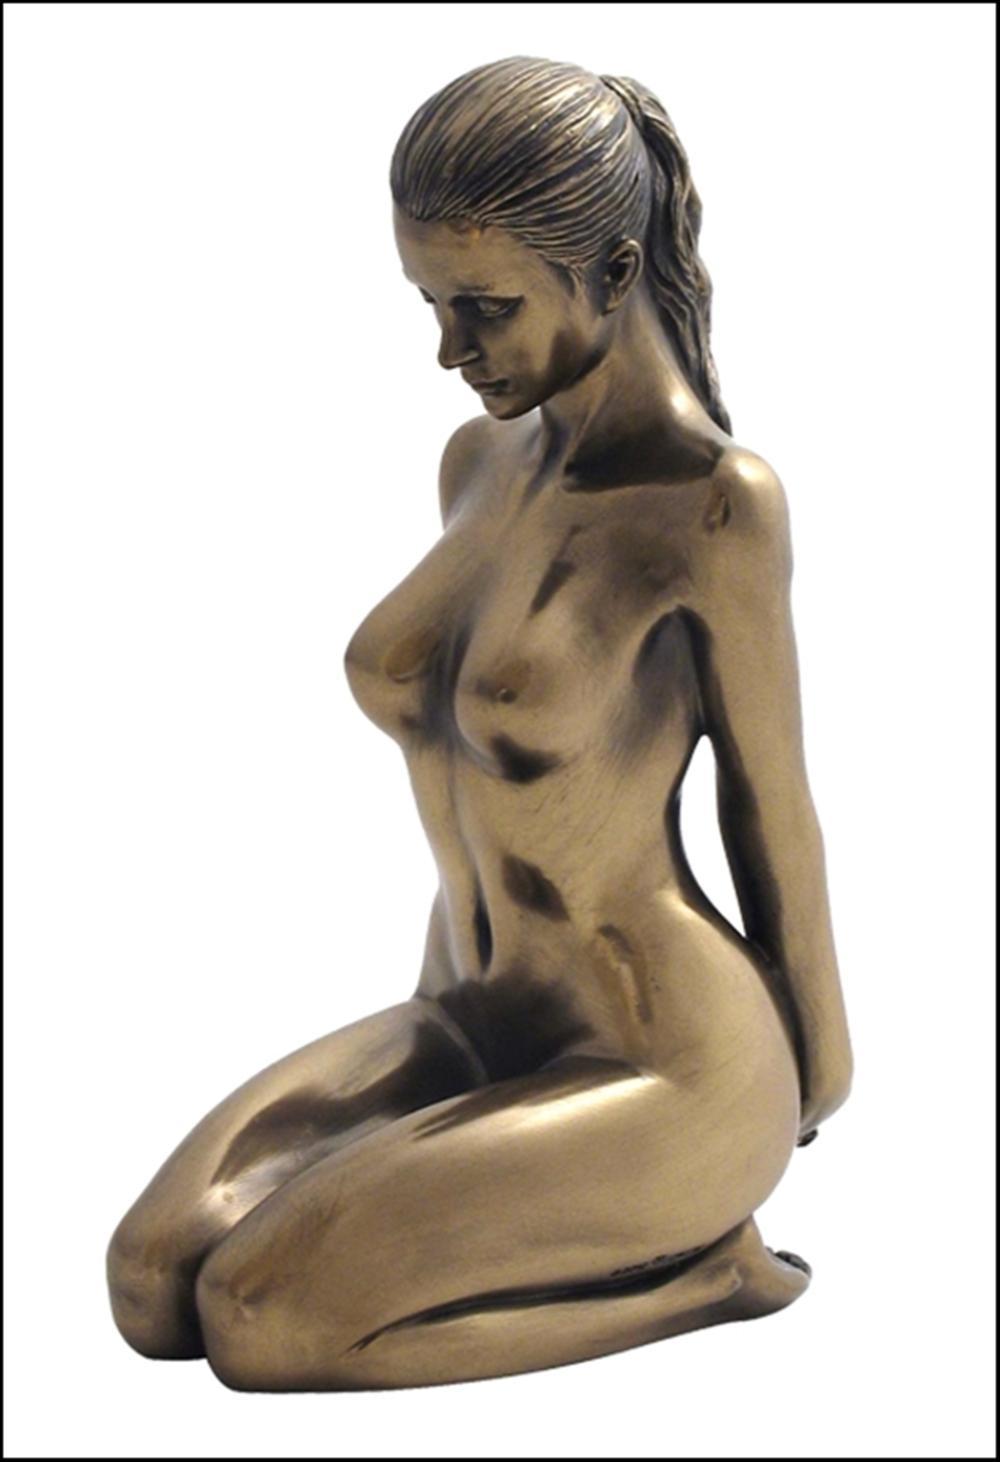 Best indoor beauty nude woman sculpture marble naked sex girl statue